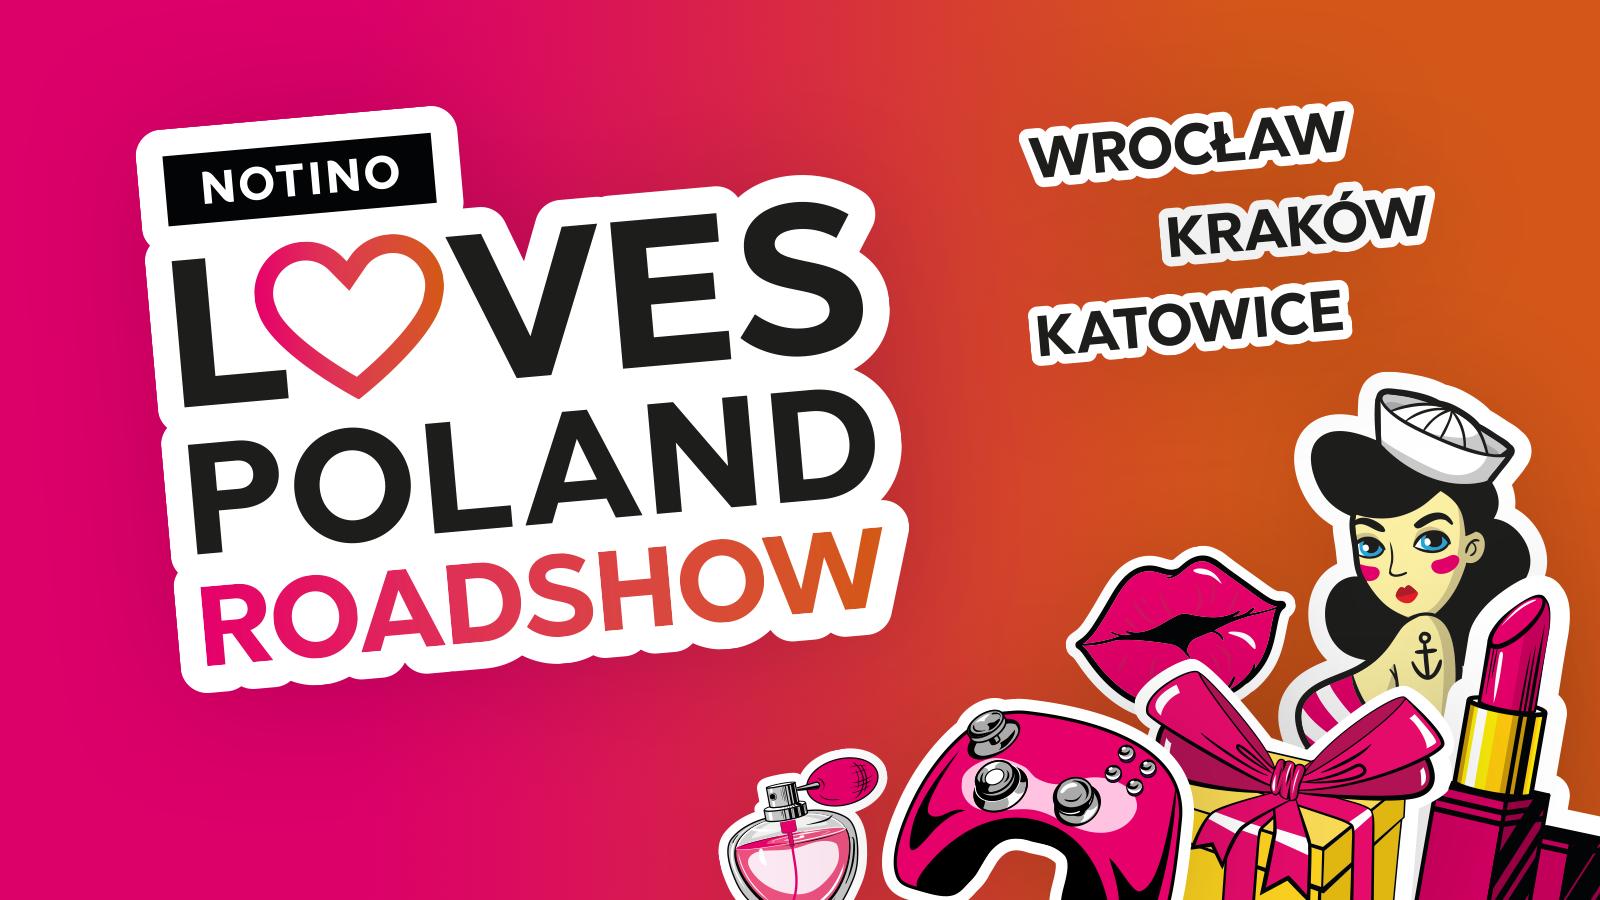 NOTINO LOVES POLAND ROADSHOW - ZAPROSZENIE NA EVENT NOTINO - KRAKÓW 07.06